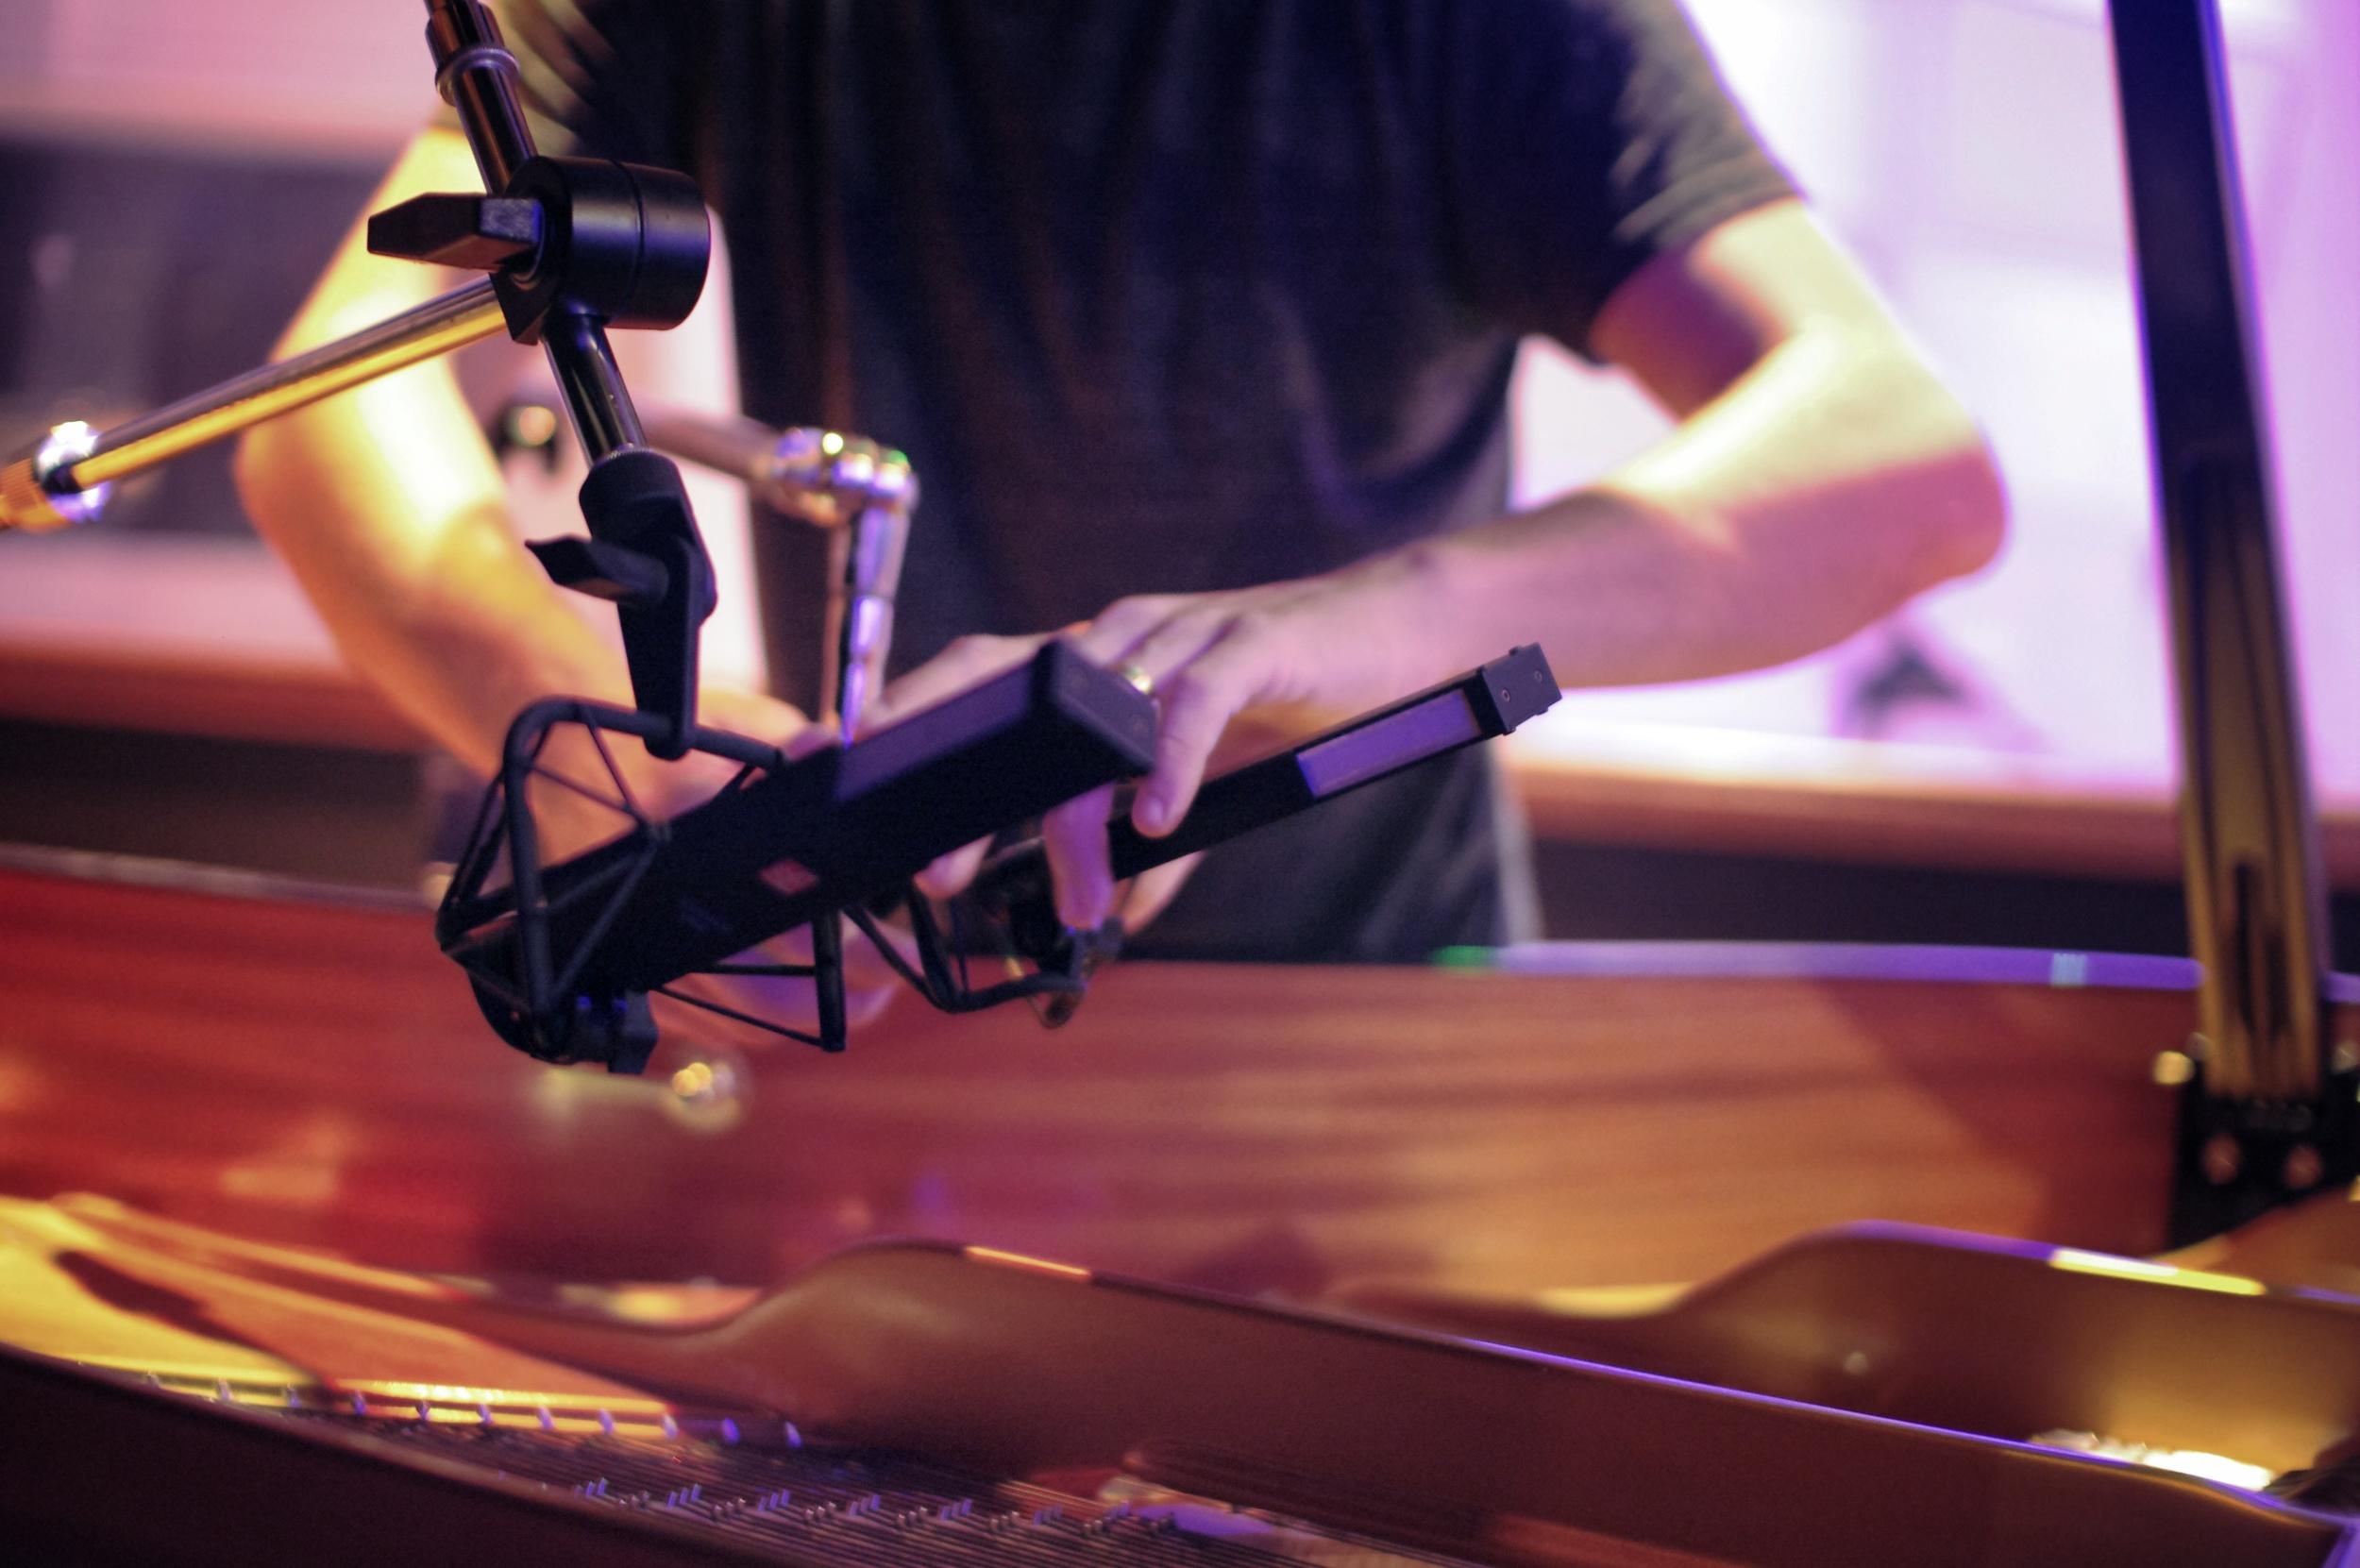 EastWest Studios, Hollywood. Photo credit: Chris Dauray